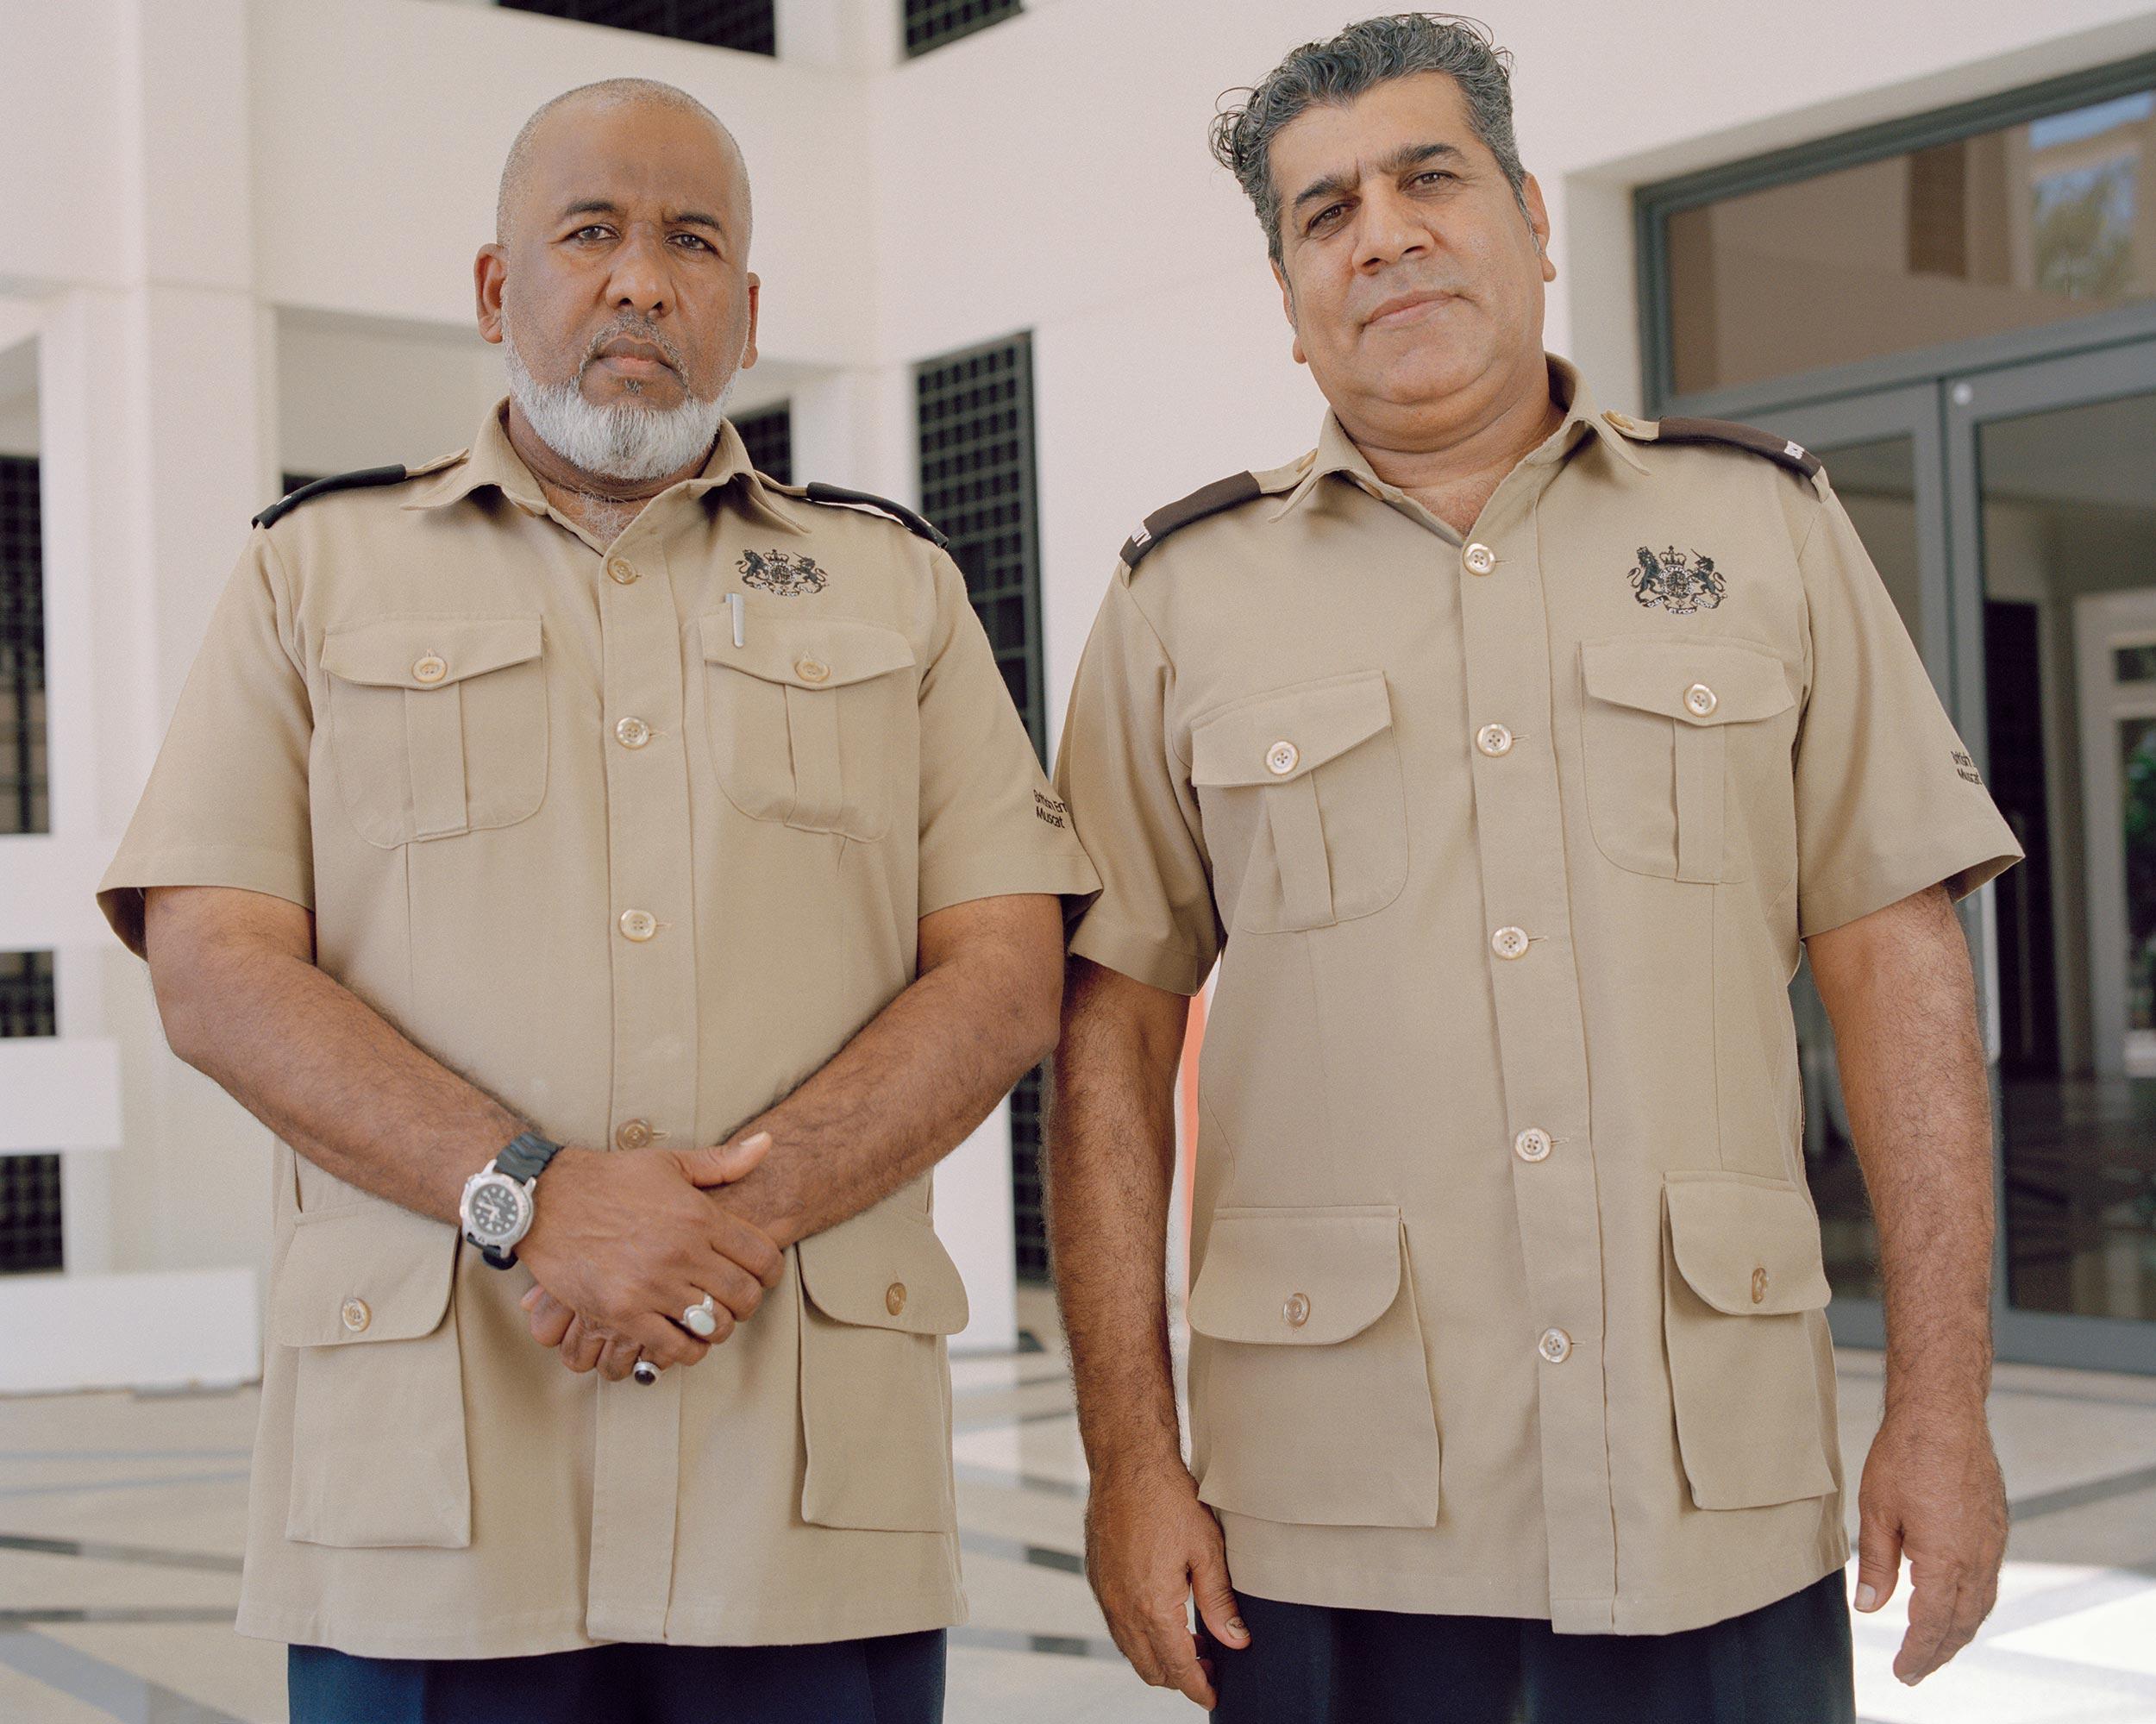 photograph of men wearing uniform from series XO